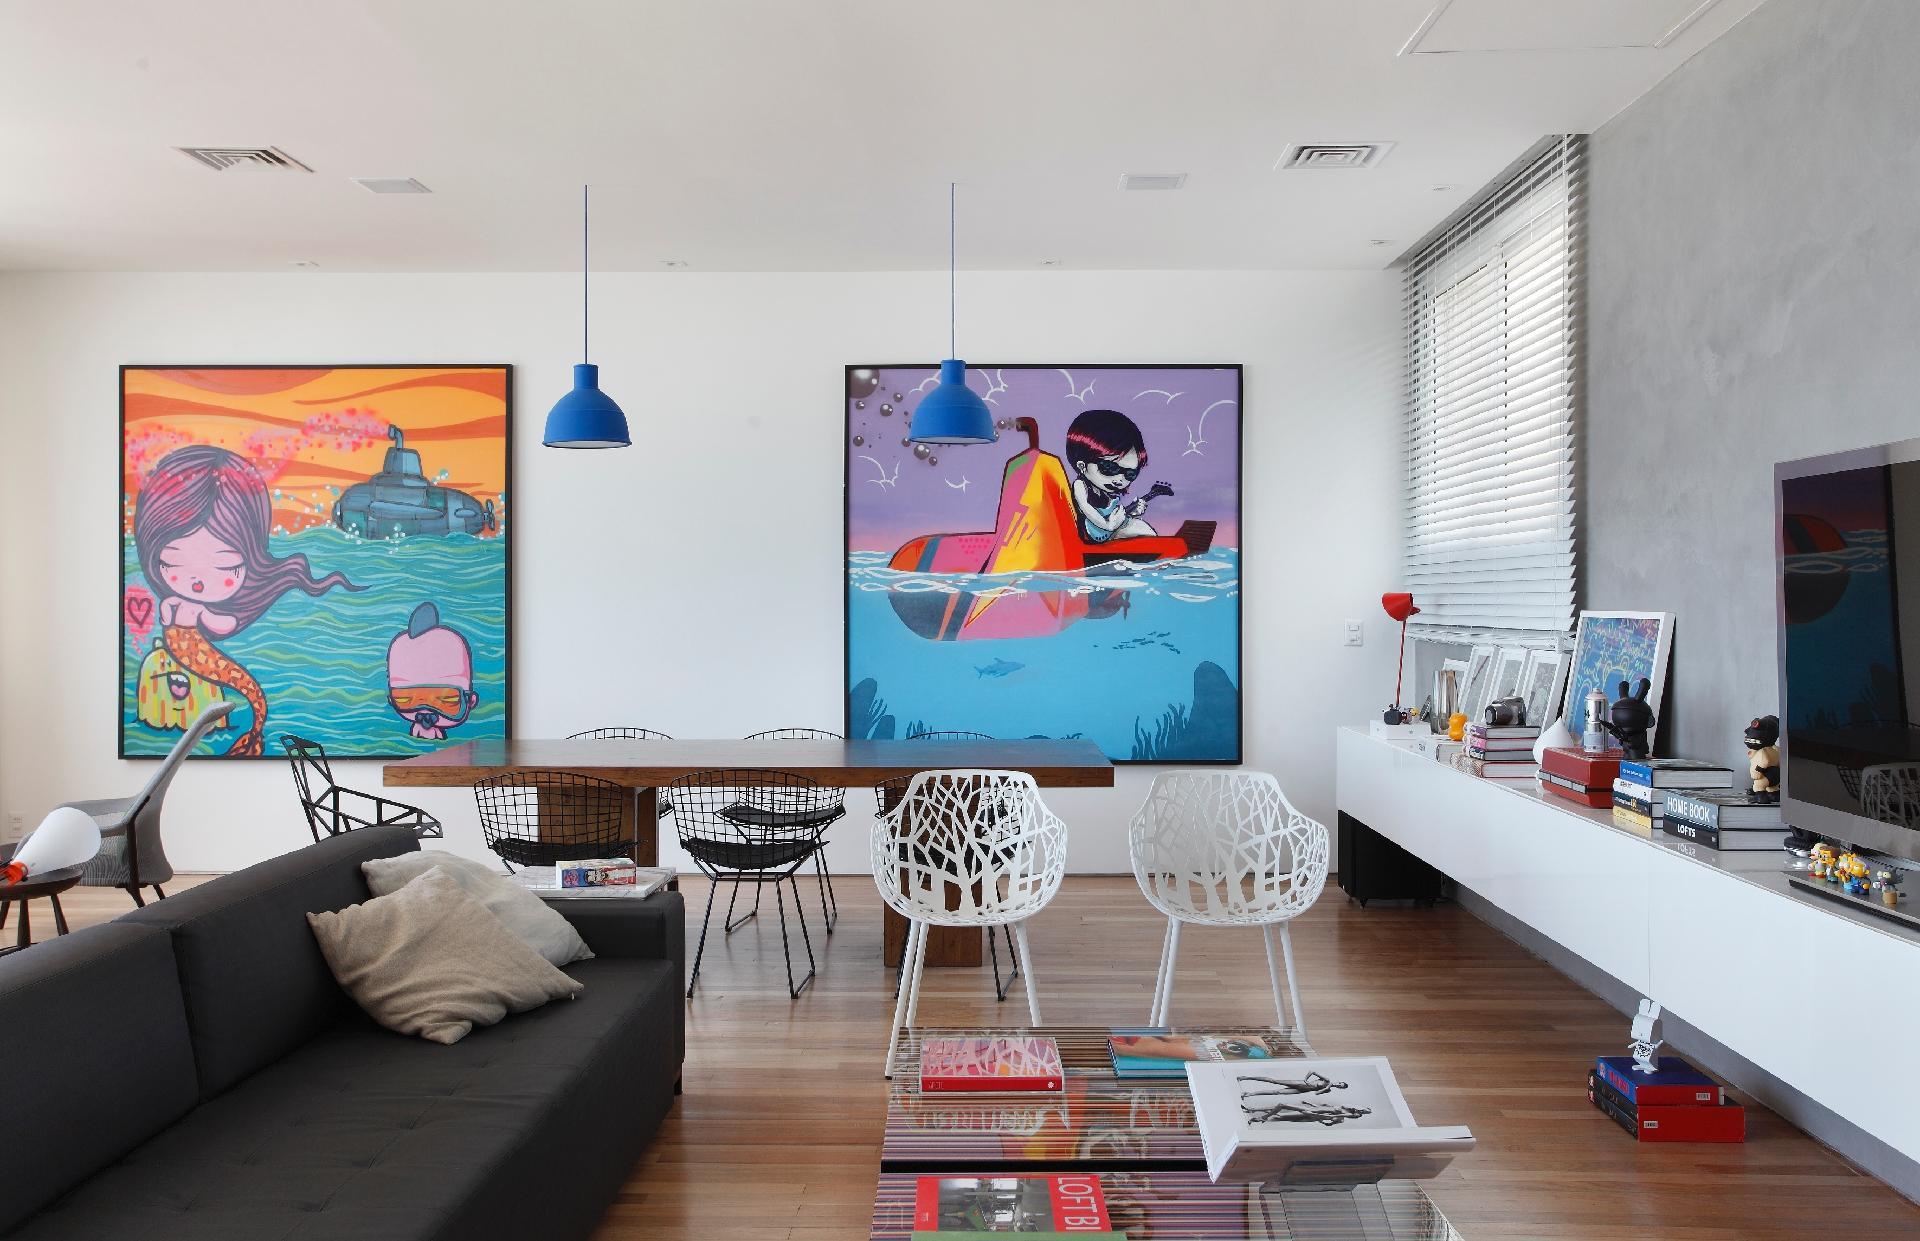 Salas de jantar ideias para decorar o ambiente bol for Mesa escritorio moderna